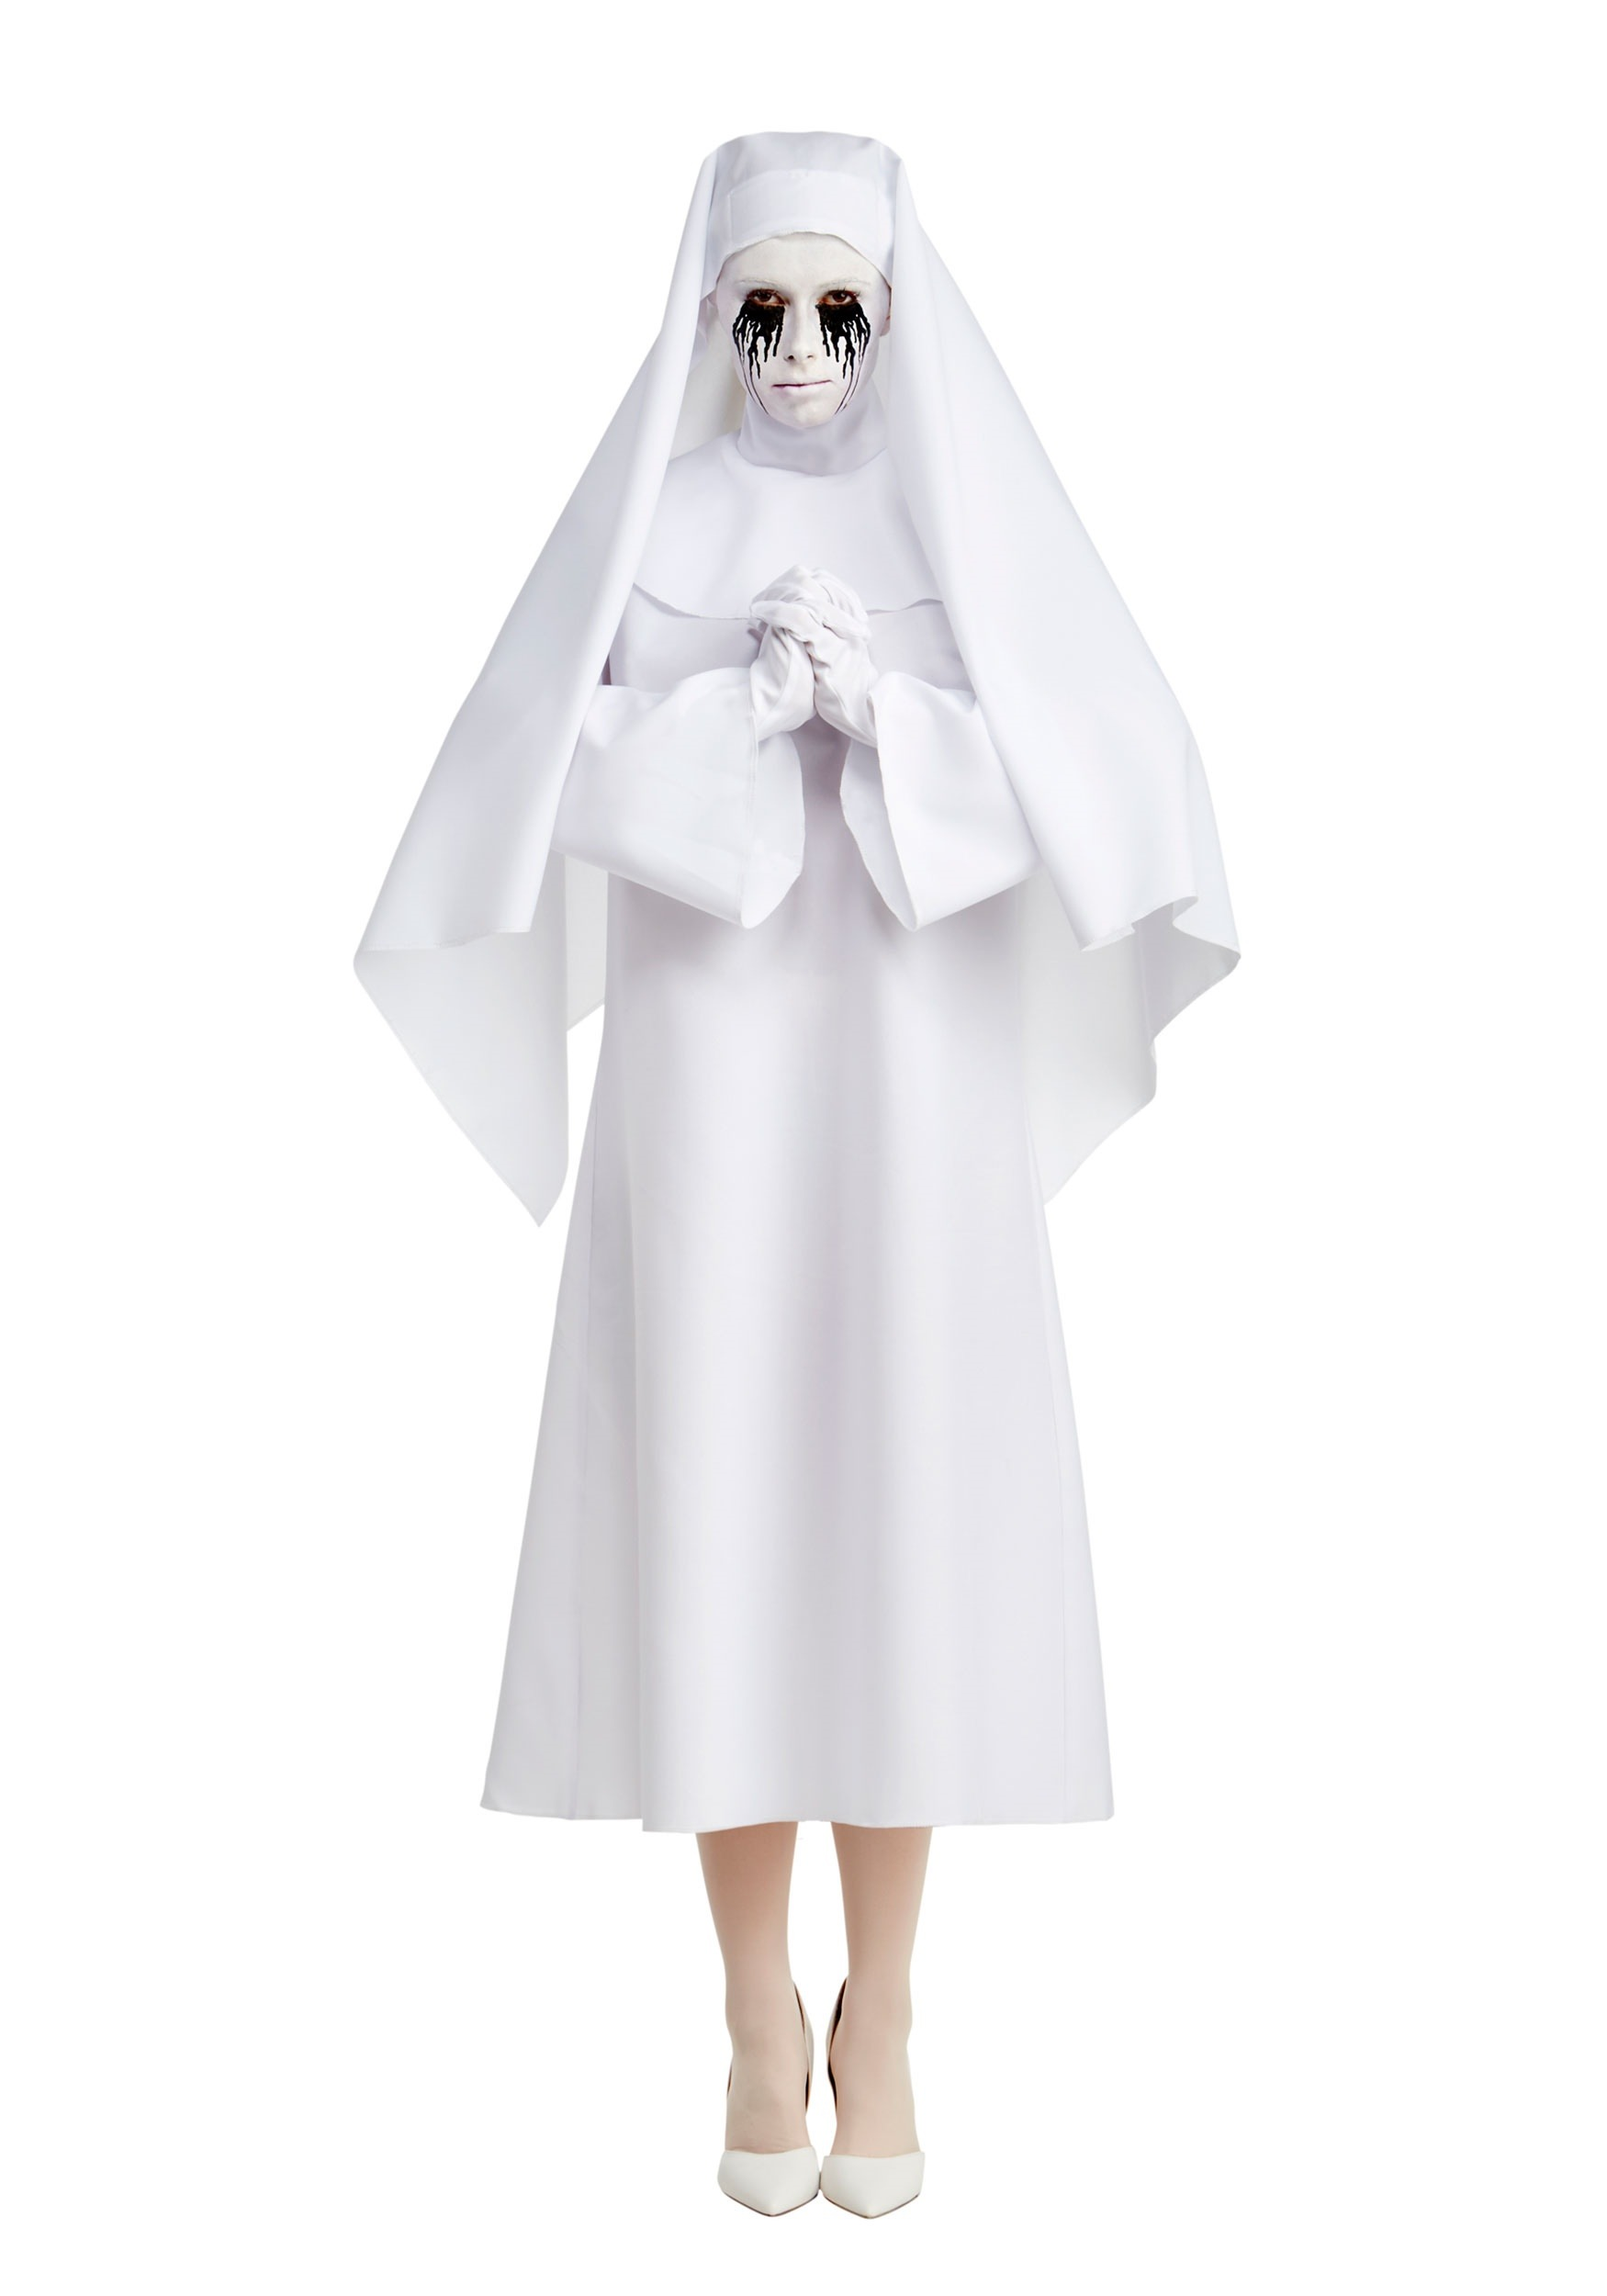 American Horror Story The White Nun Deluxe Costume for Women